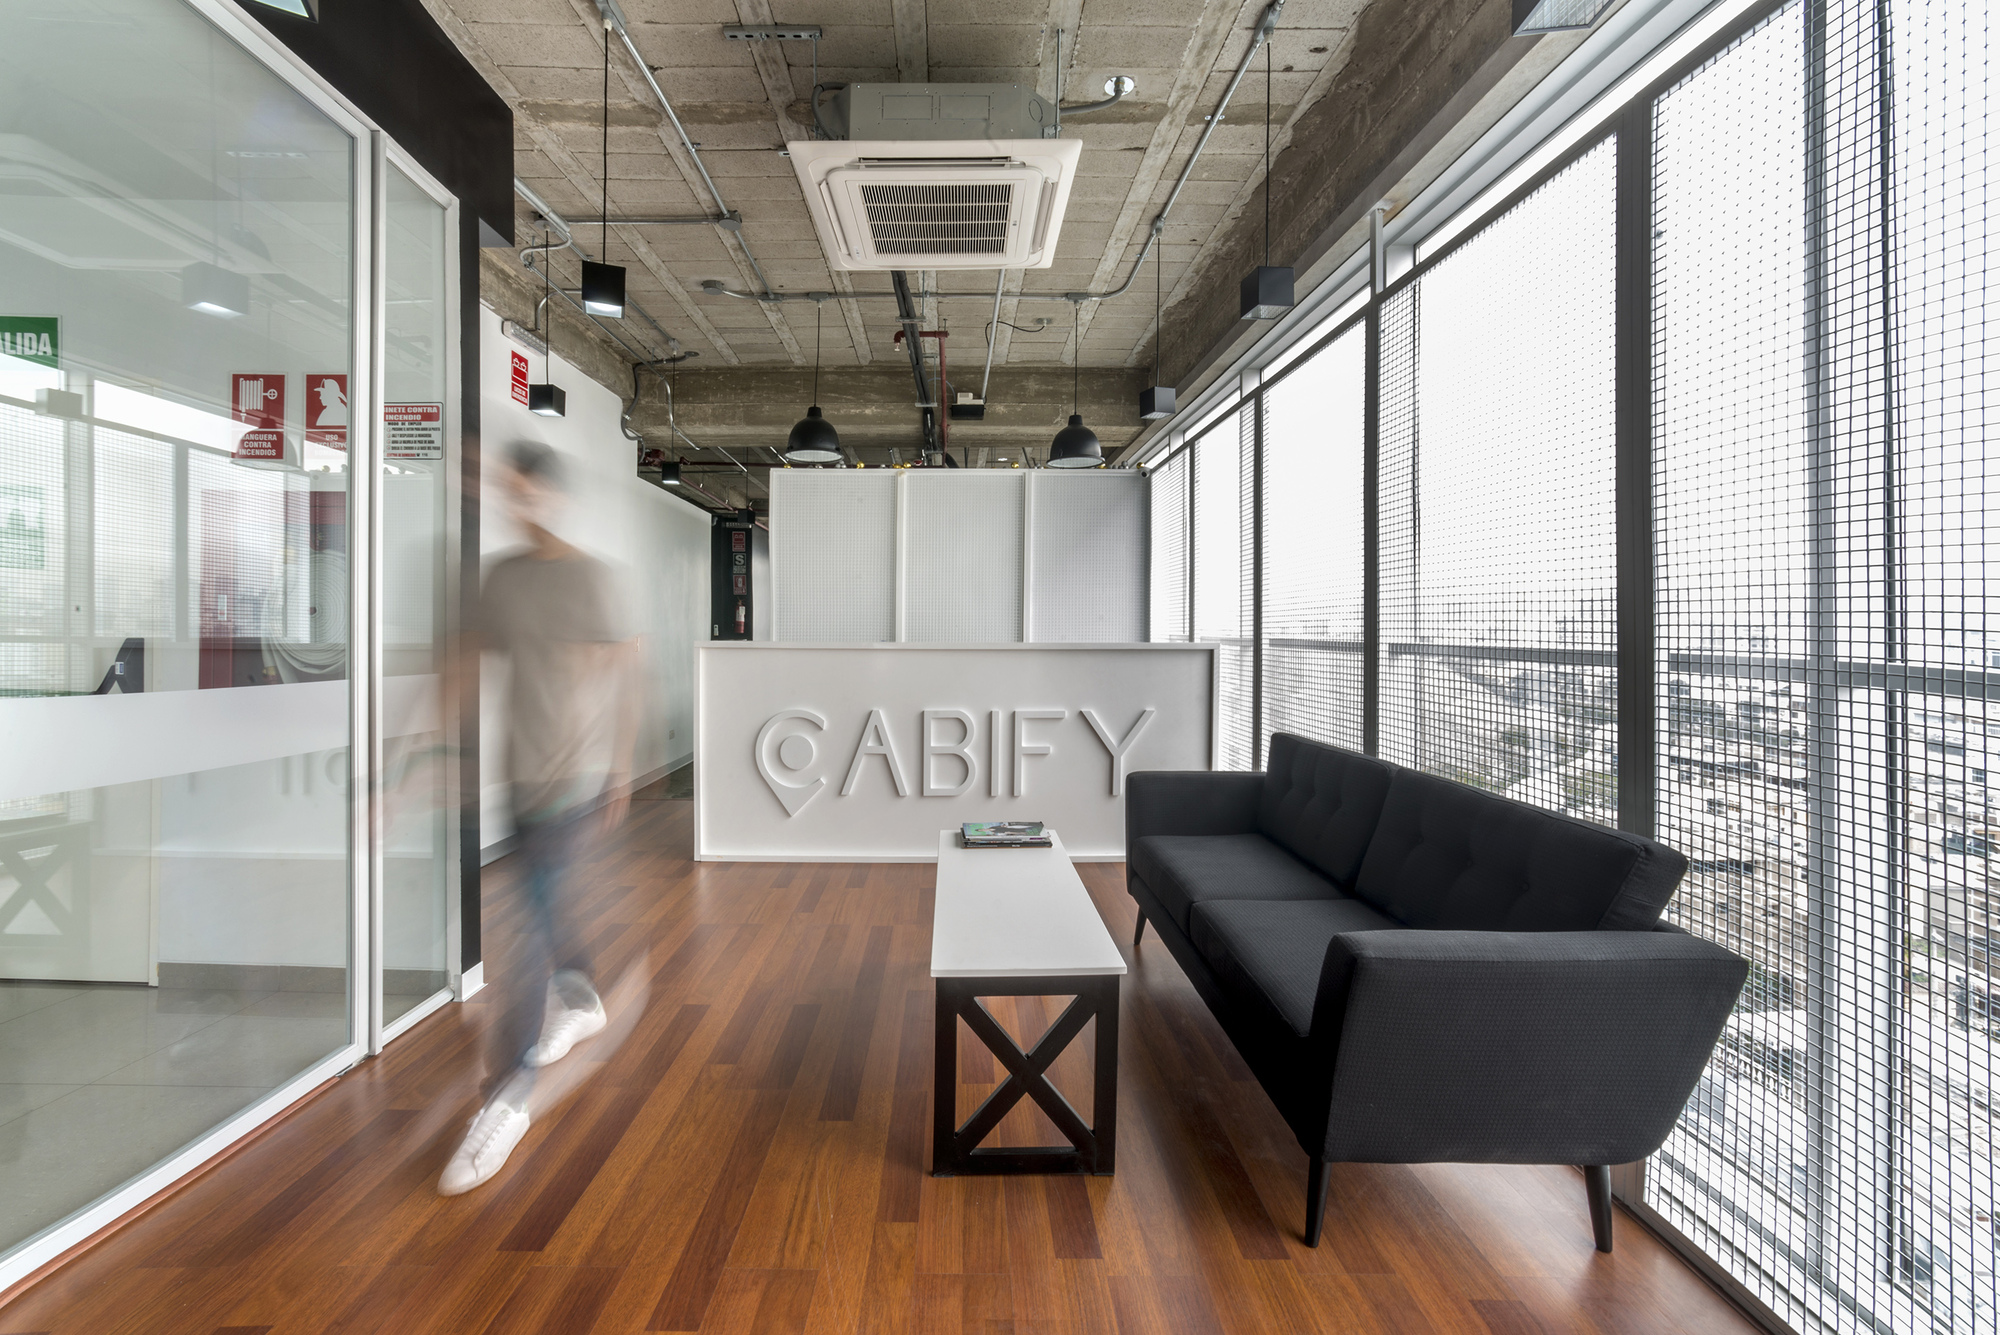 Oficinas cabify tru arquitectos archdaily m xico - Arquitectos de interiores famosos ...